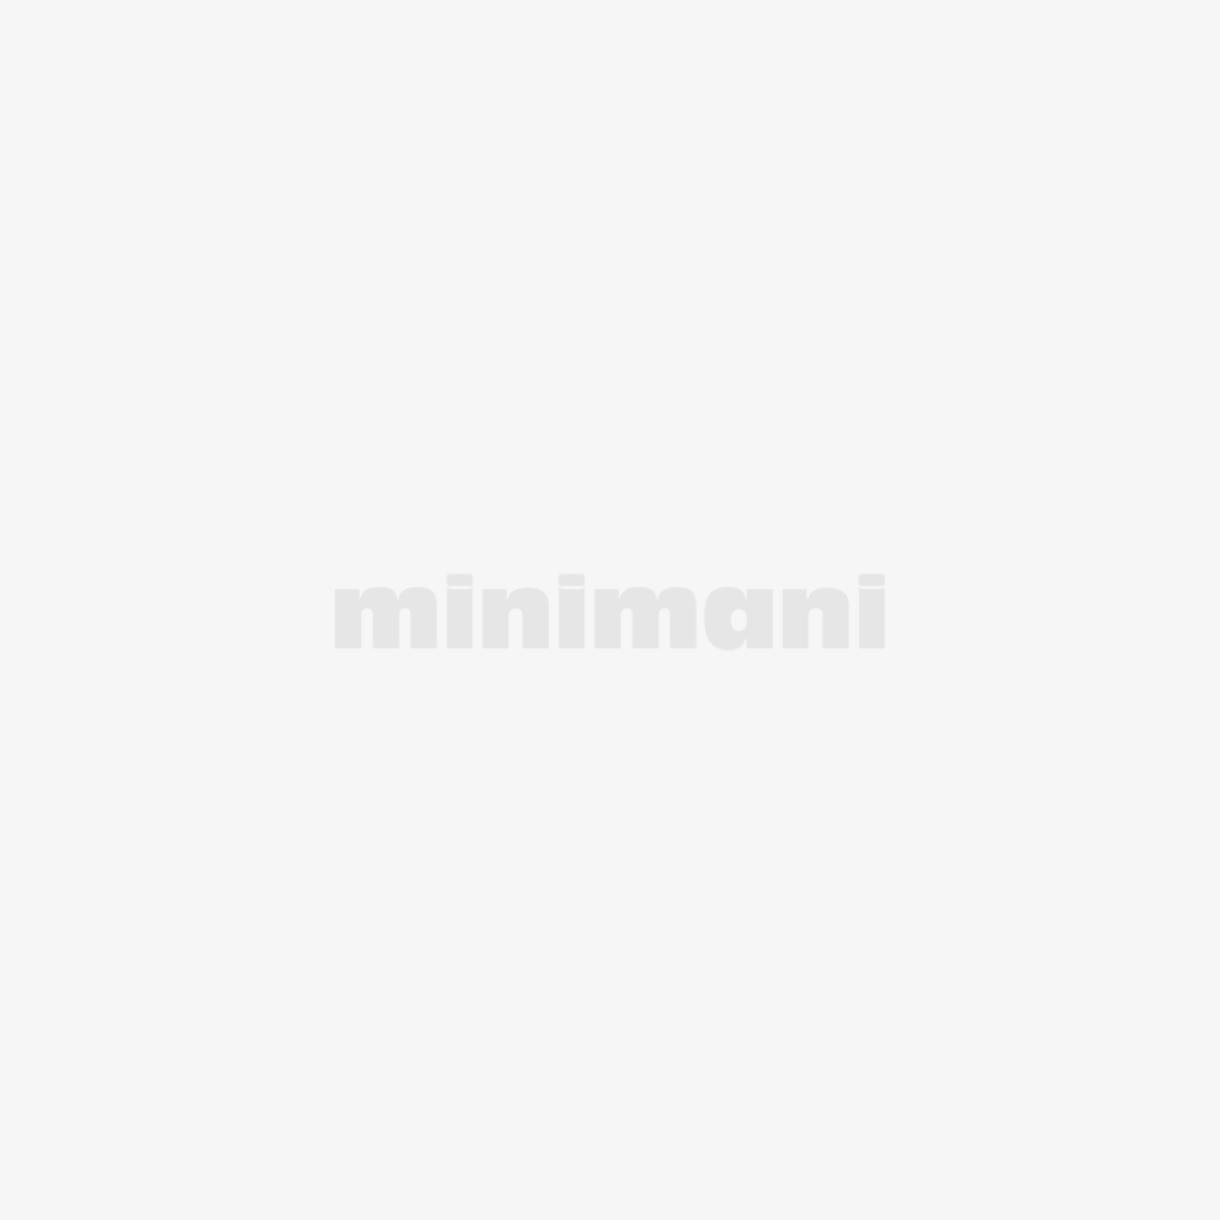 SANKO GALVANOITU 1.2L